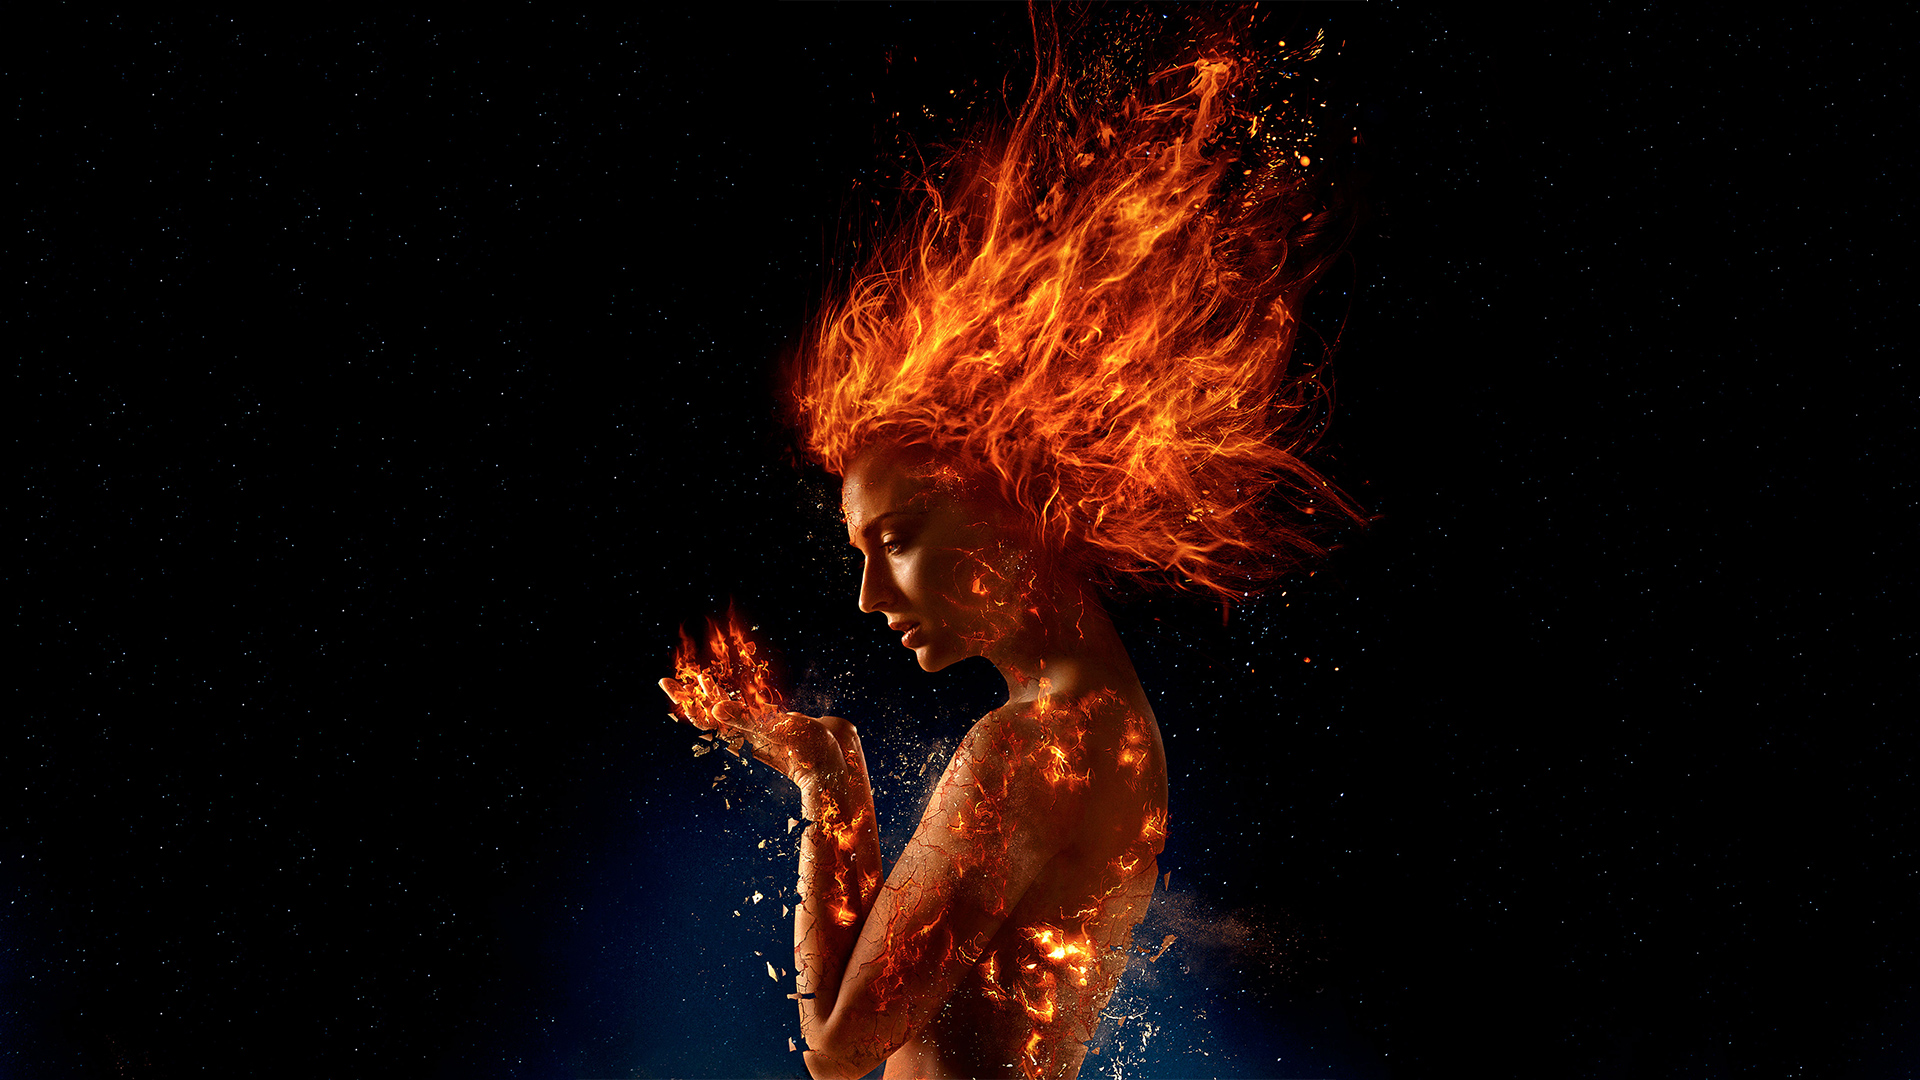 12. X-Men: Dark Phoenix